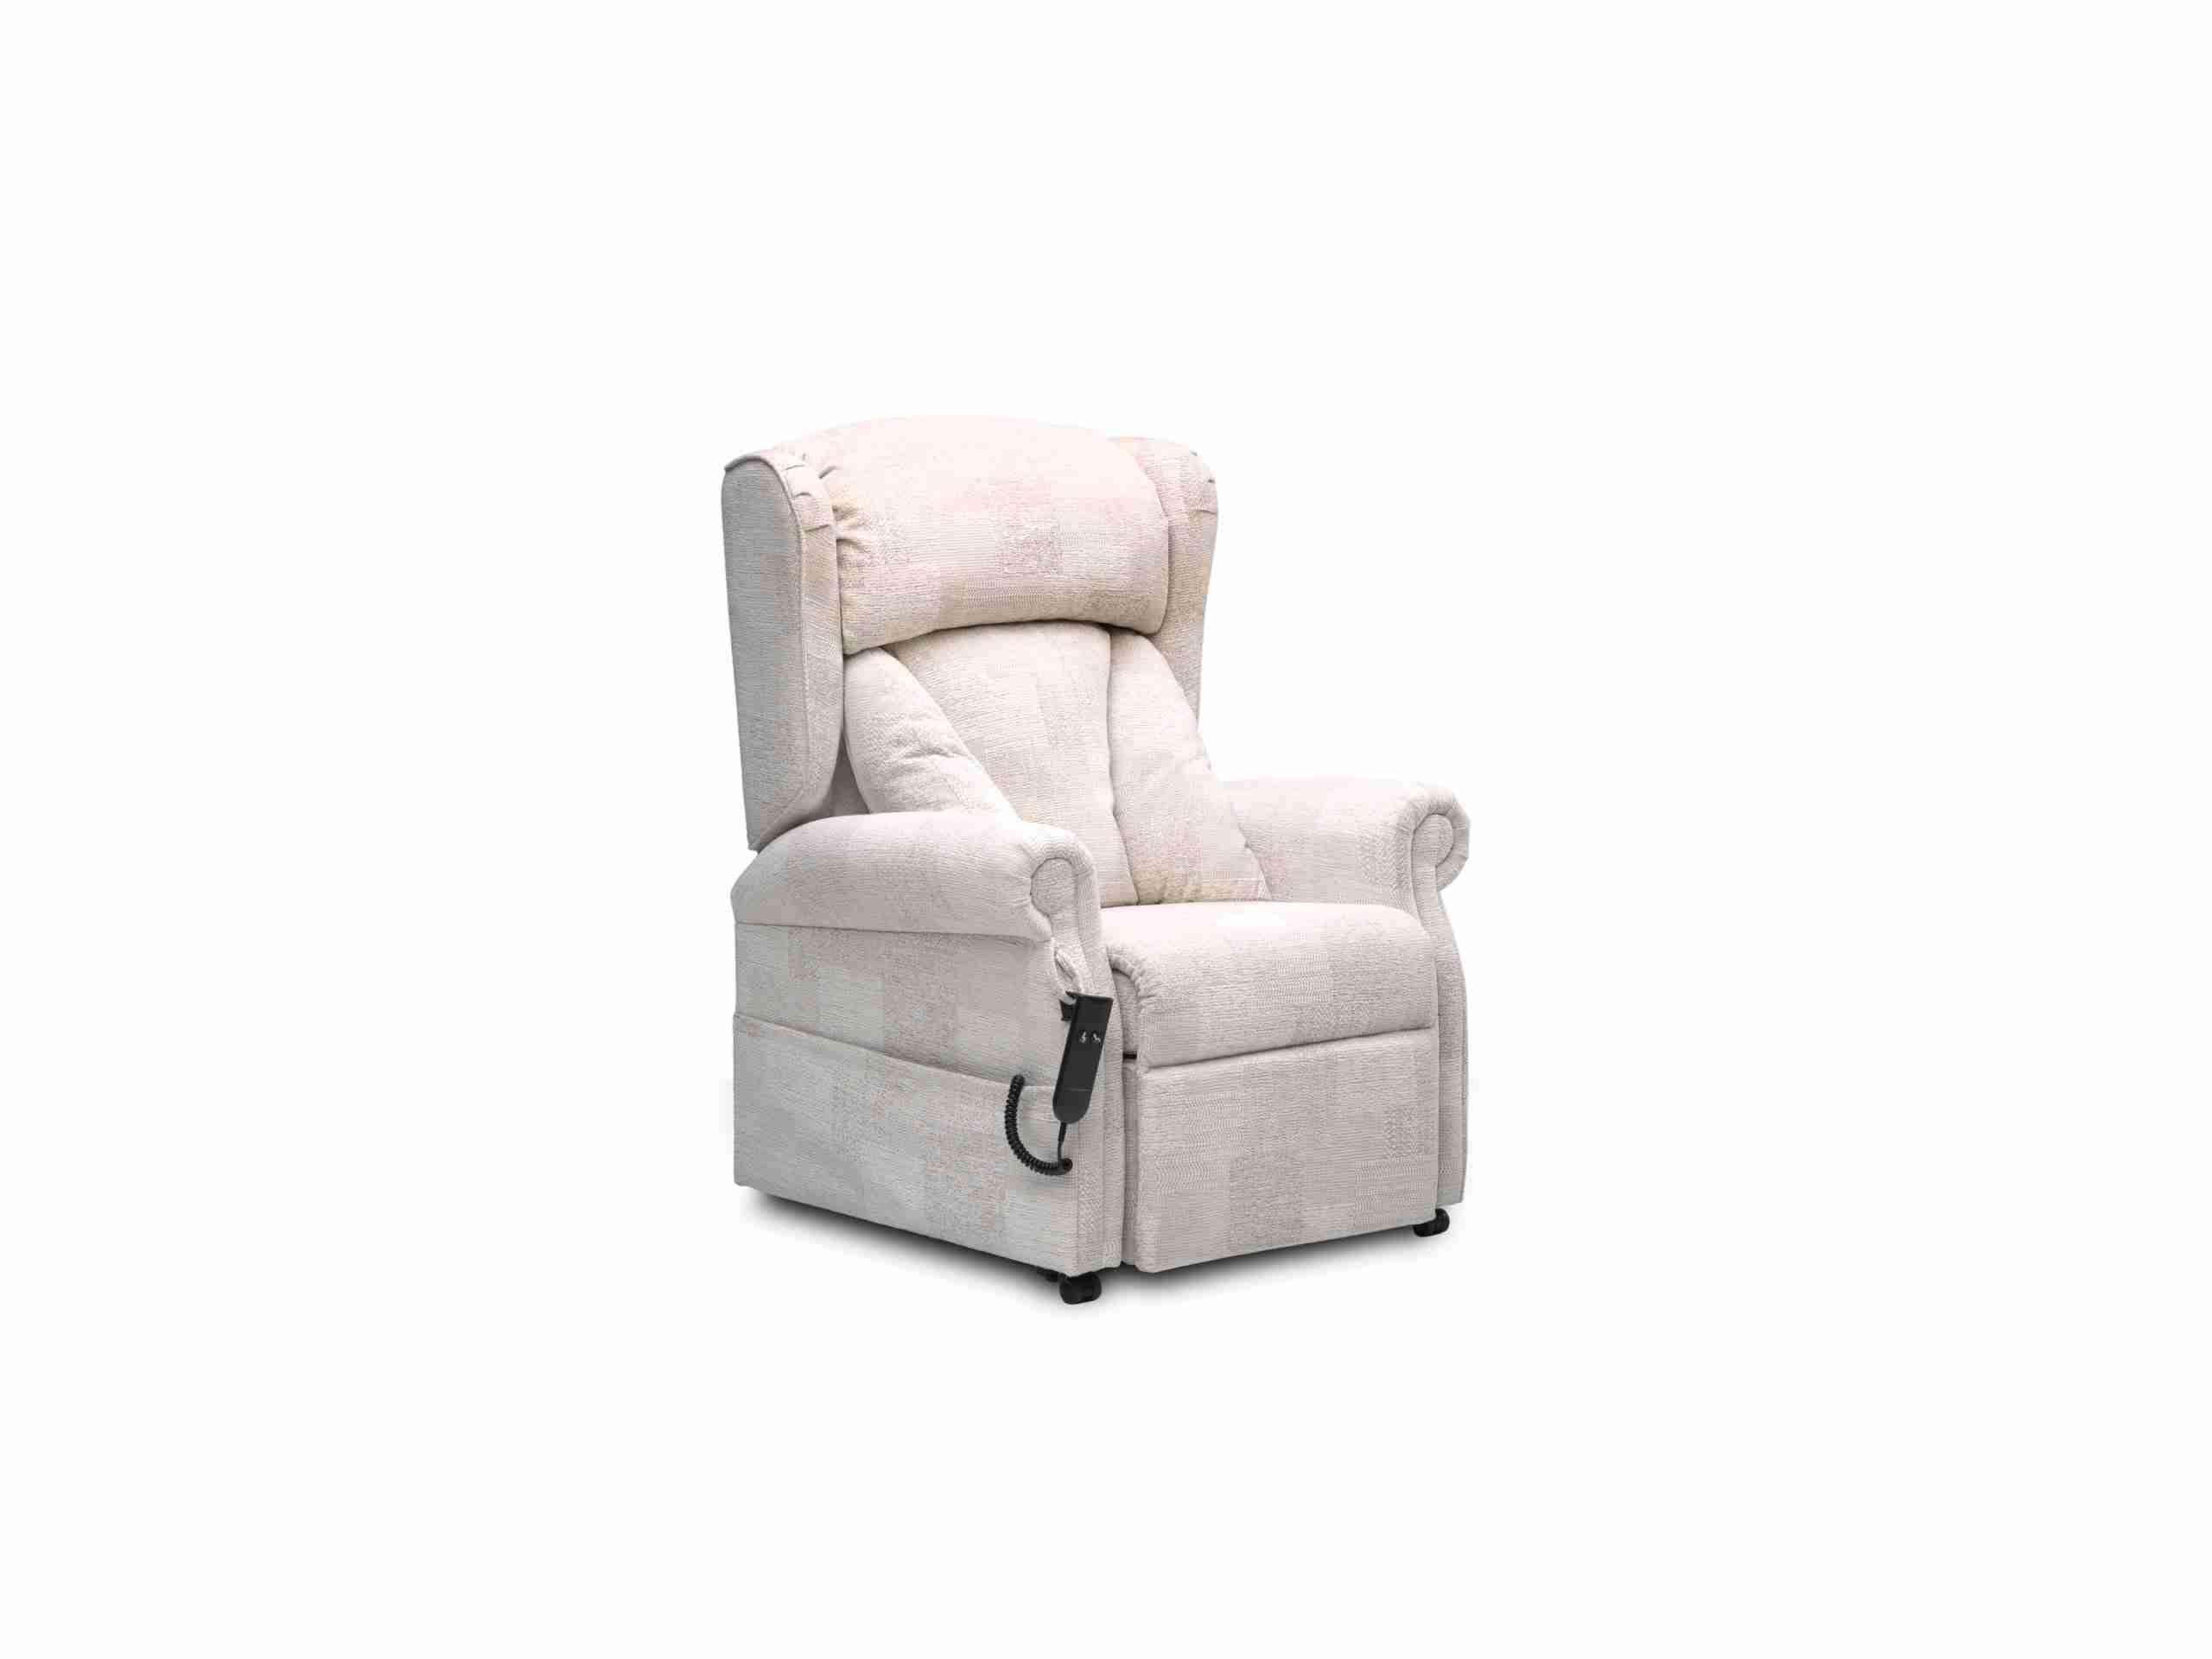 Chepstow Chair Repose06